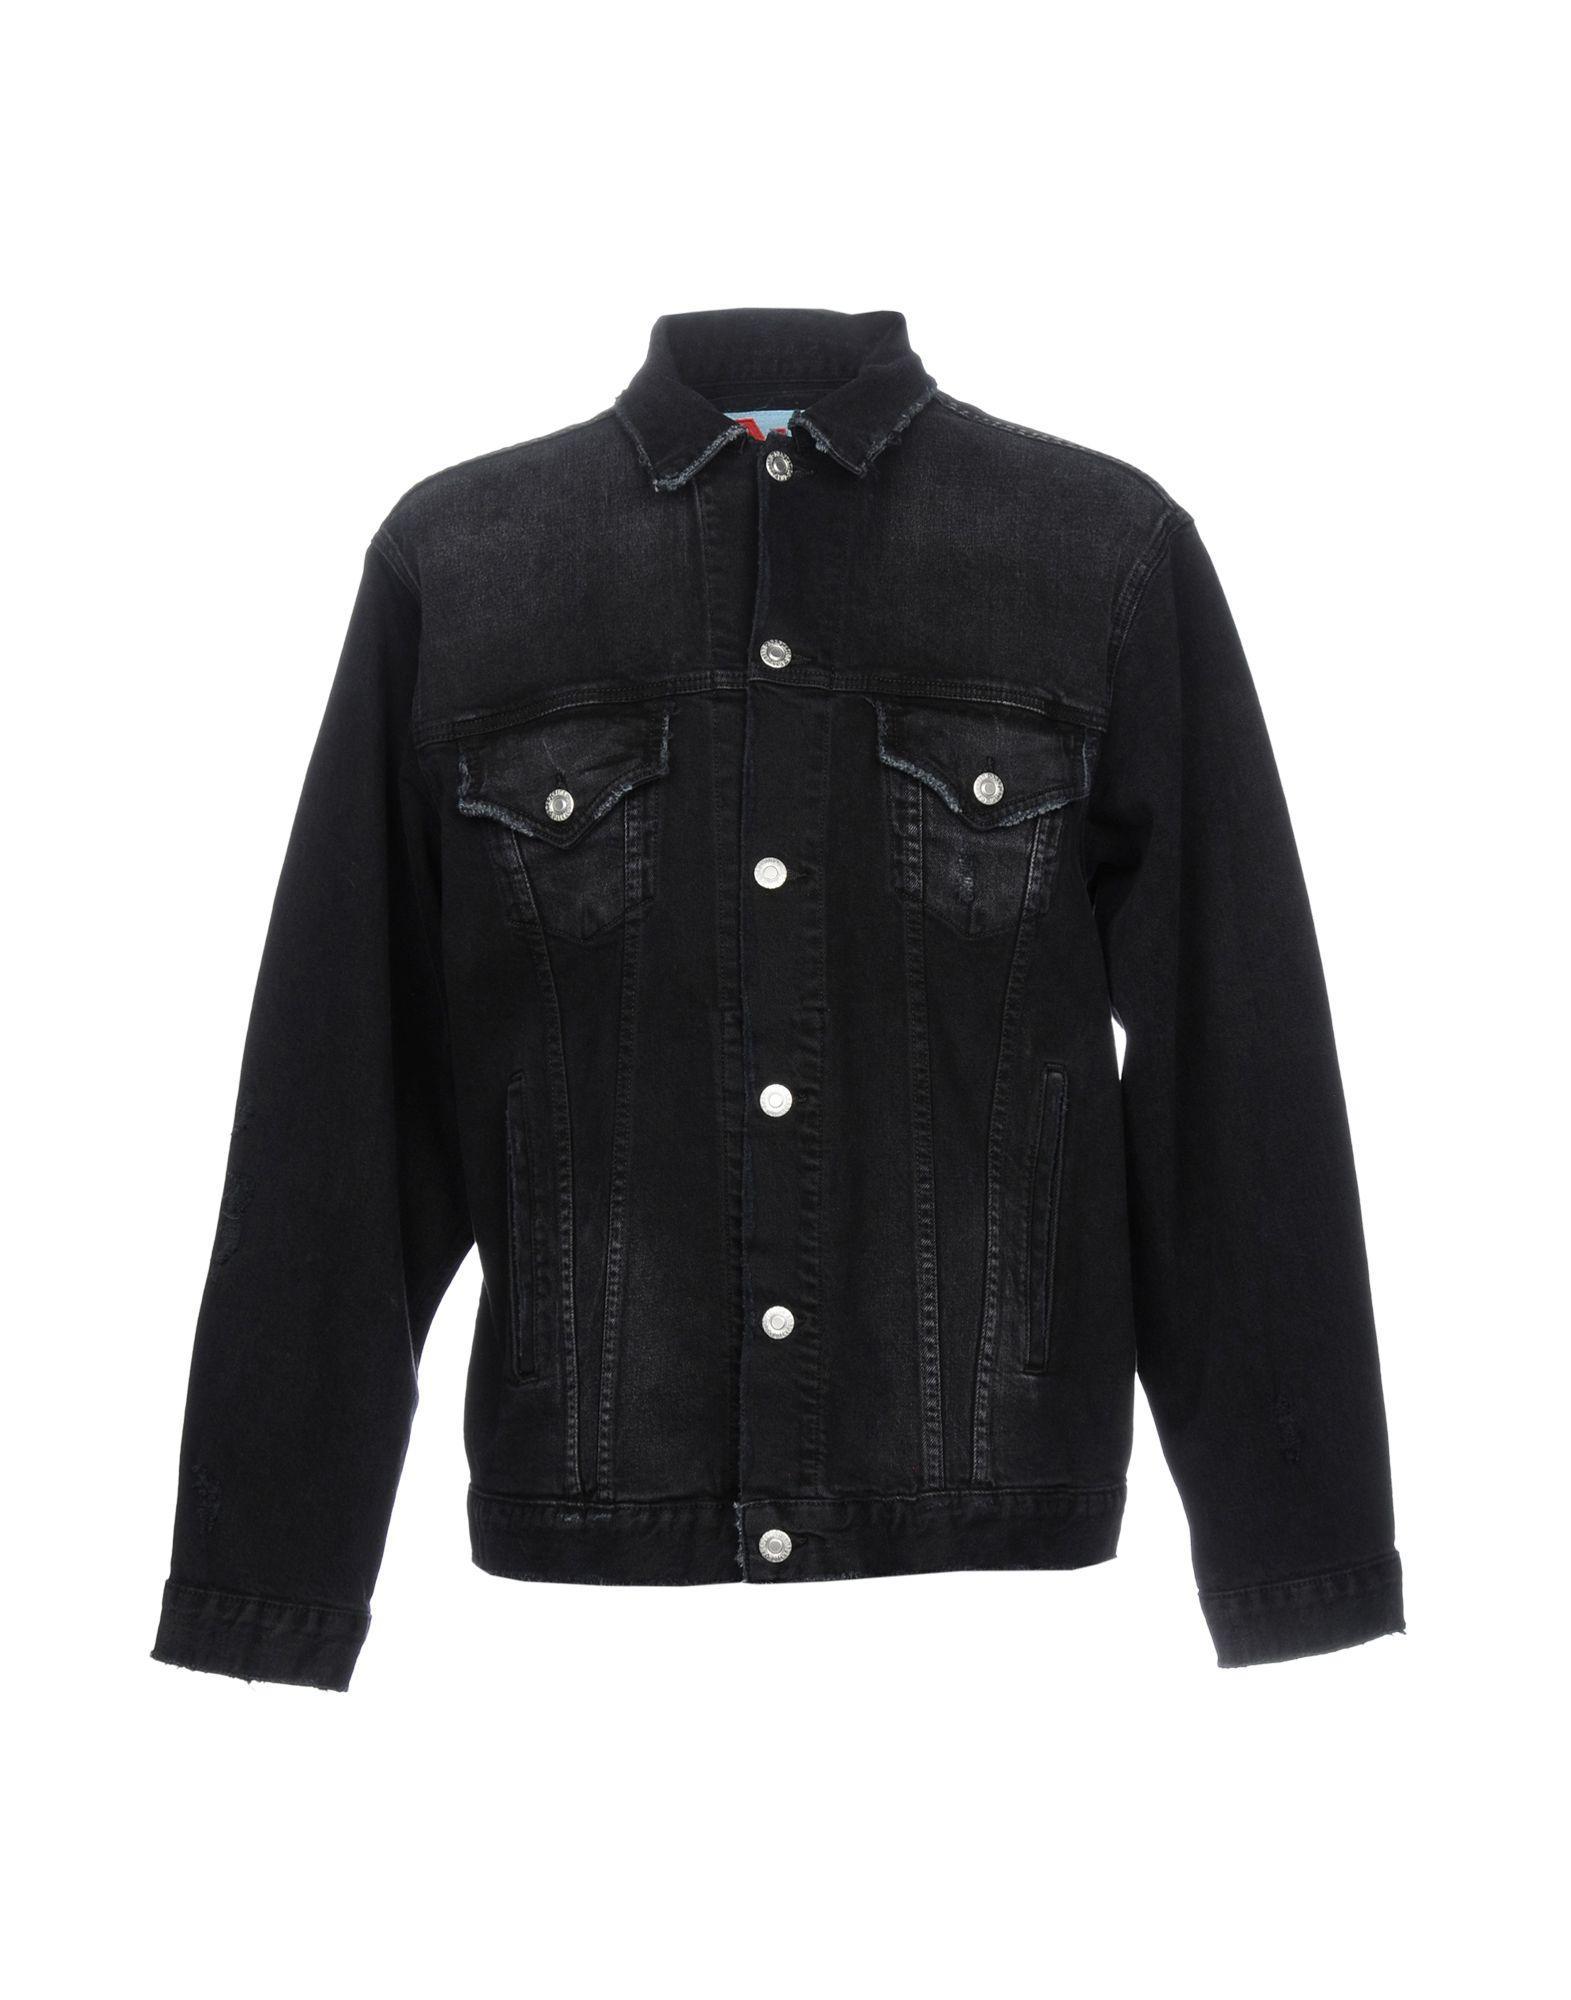 Adaptation Denim Jacket In Black